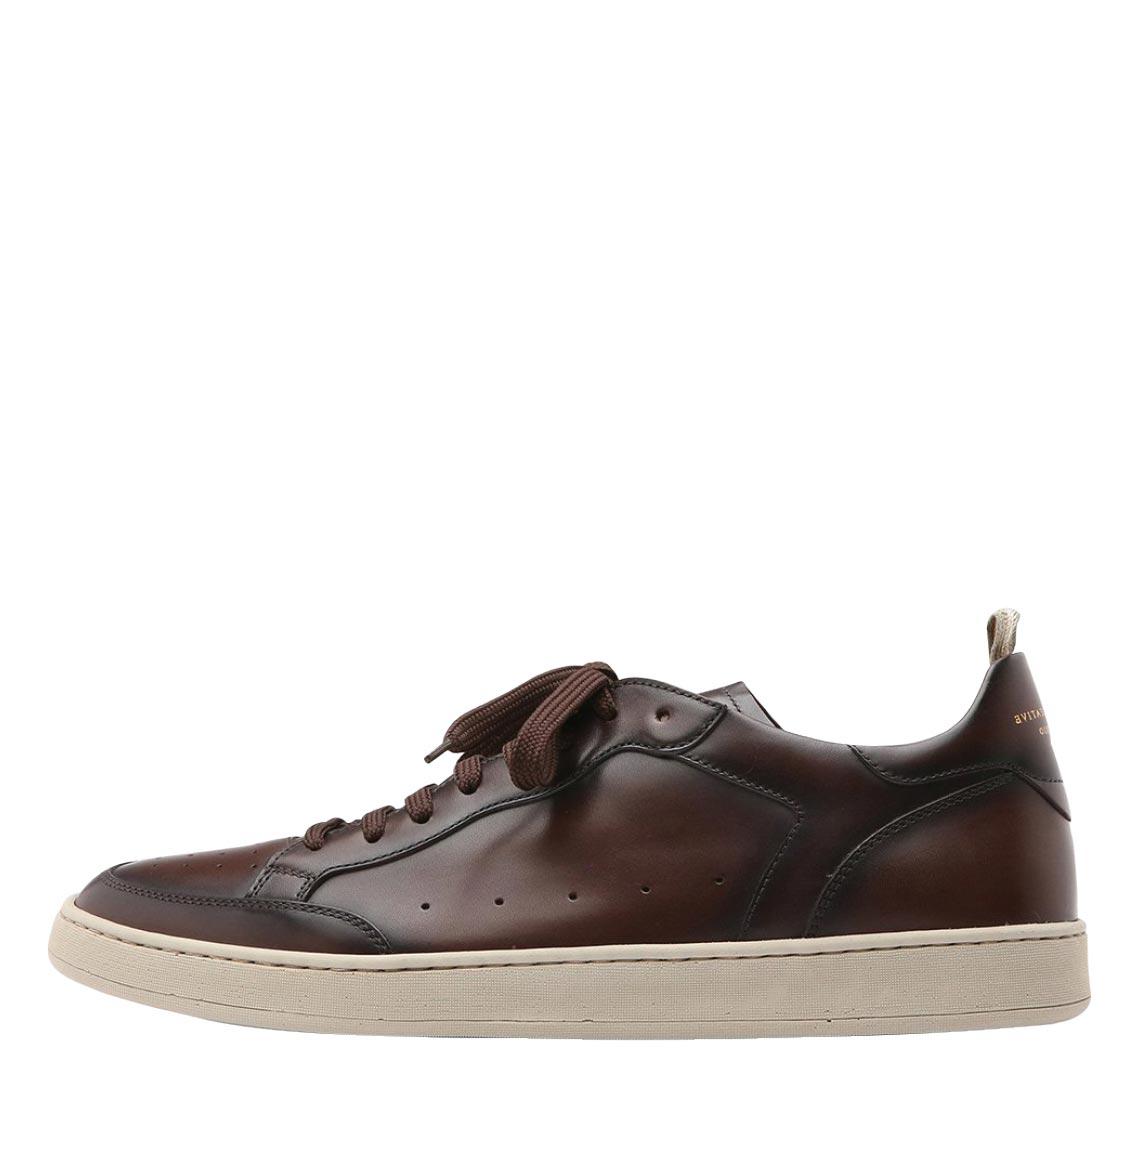 Officine Creative Kareem Lux Dark Brown Leather Sneakers